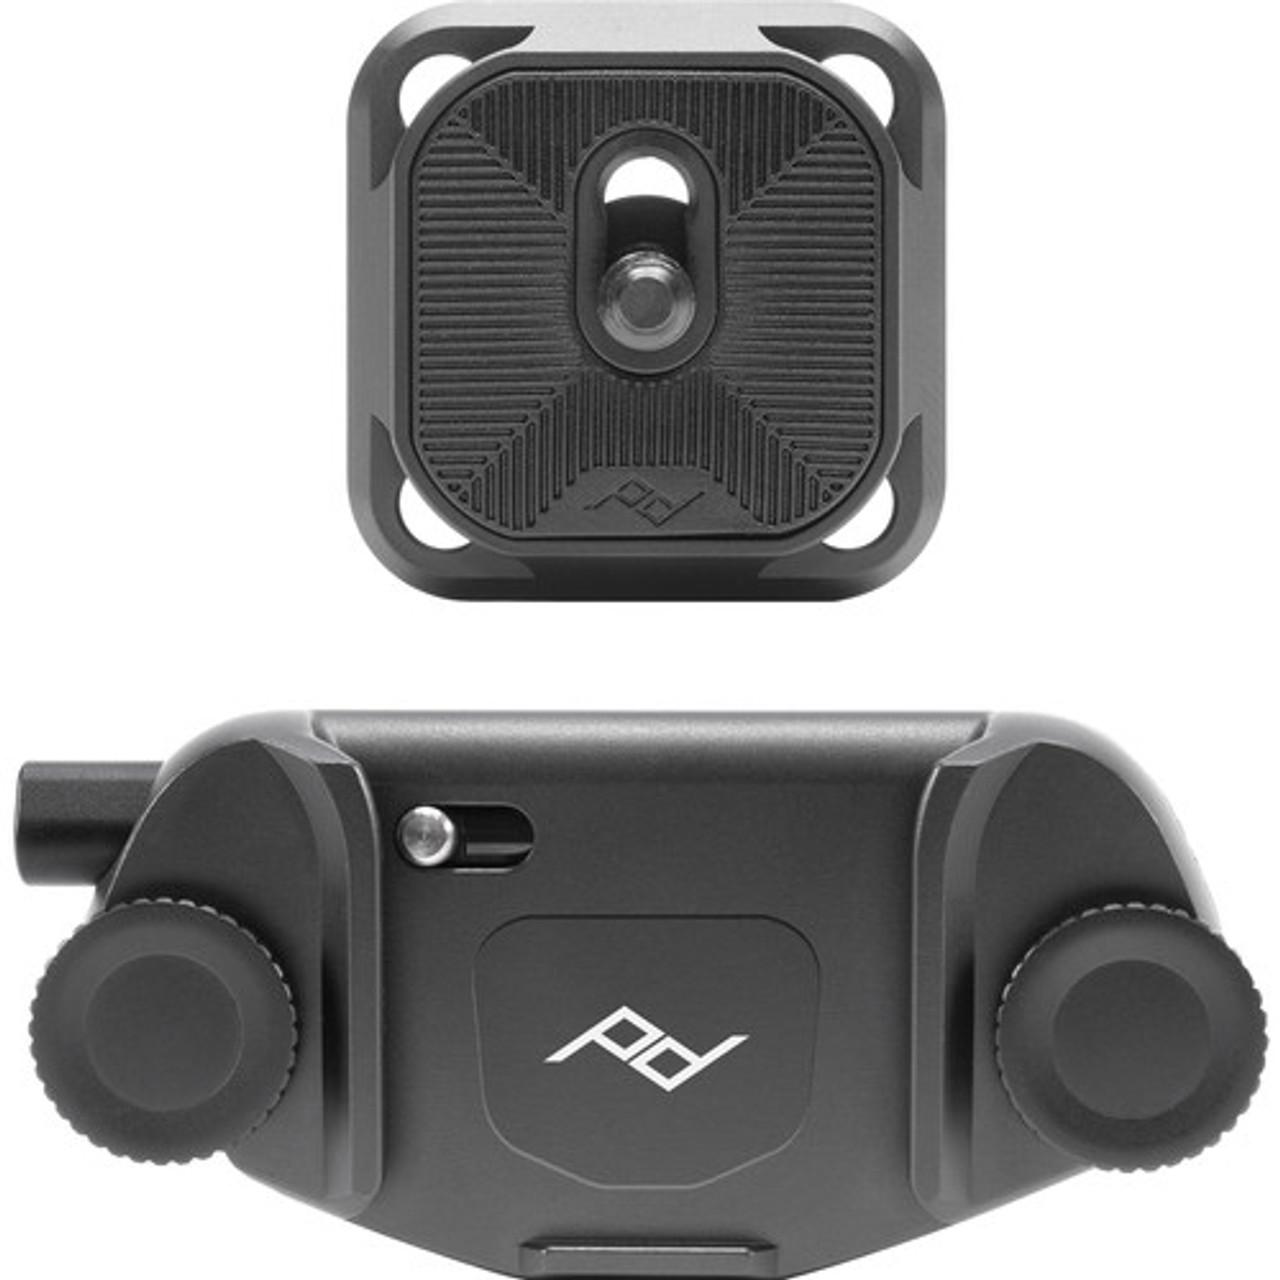 Peak Design Capture Camera Clip v3